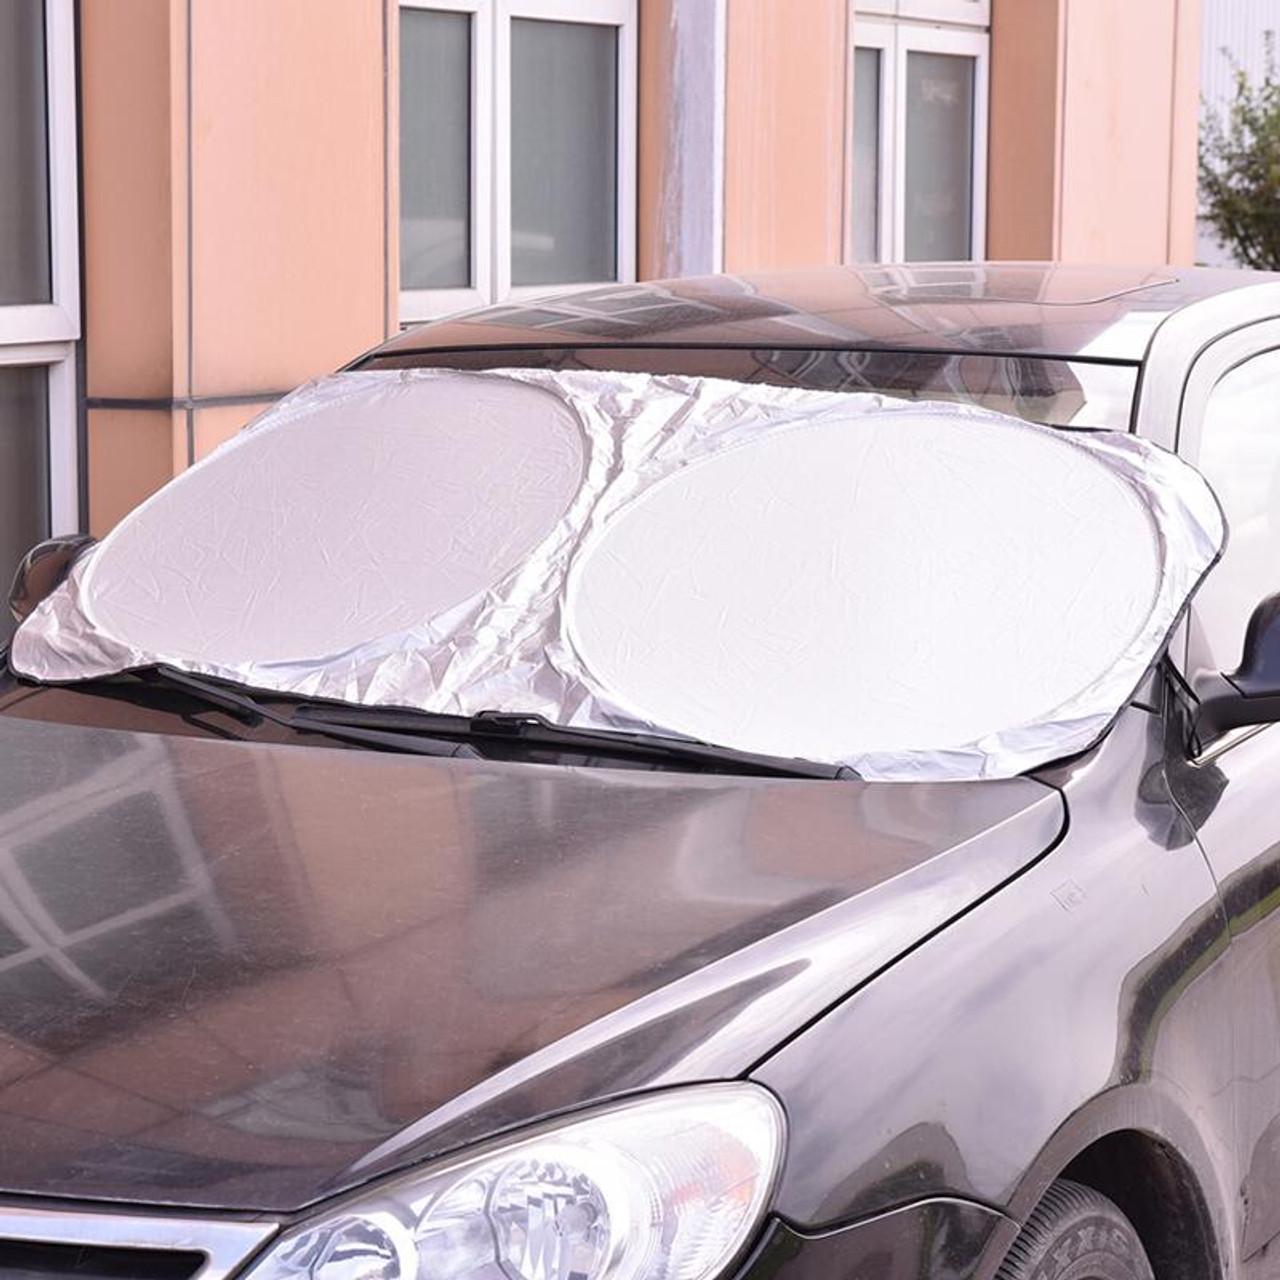 UV Protect Car Window Film Hot Auto Visor Windshield Windscreen Sun Block  Cover Folding Jumbo Front Rear Car Window Sun Shade - OnshopDeals.Com fabead9516a